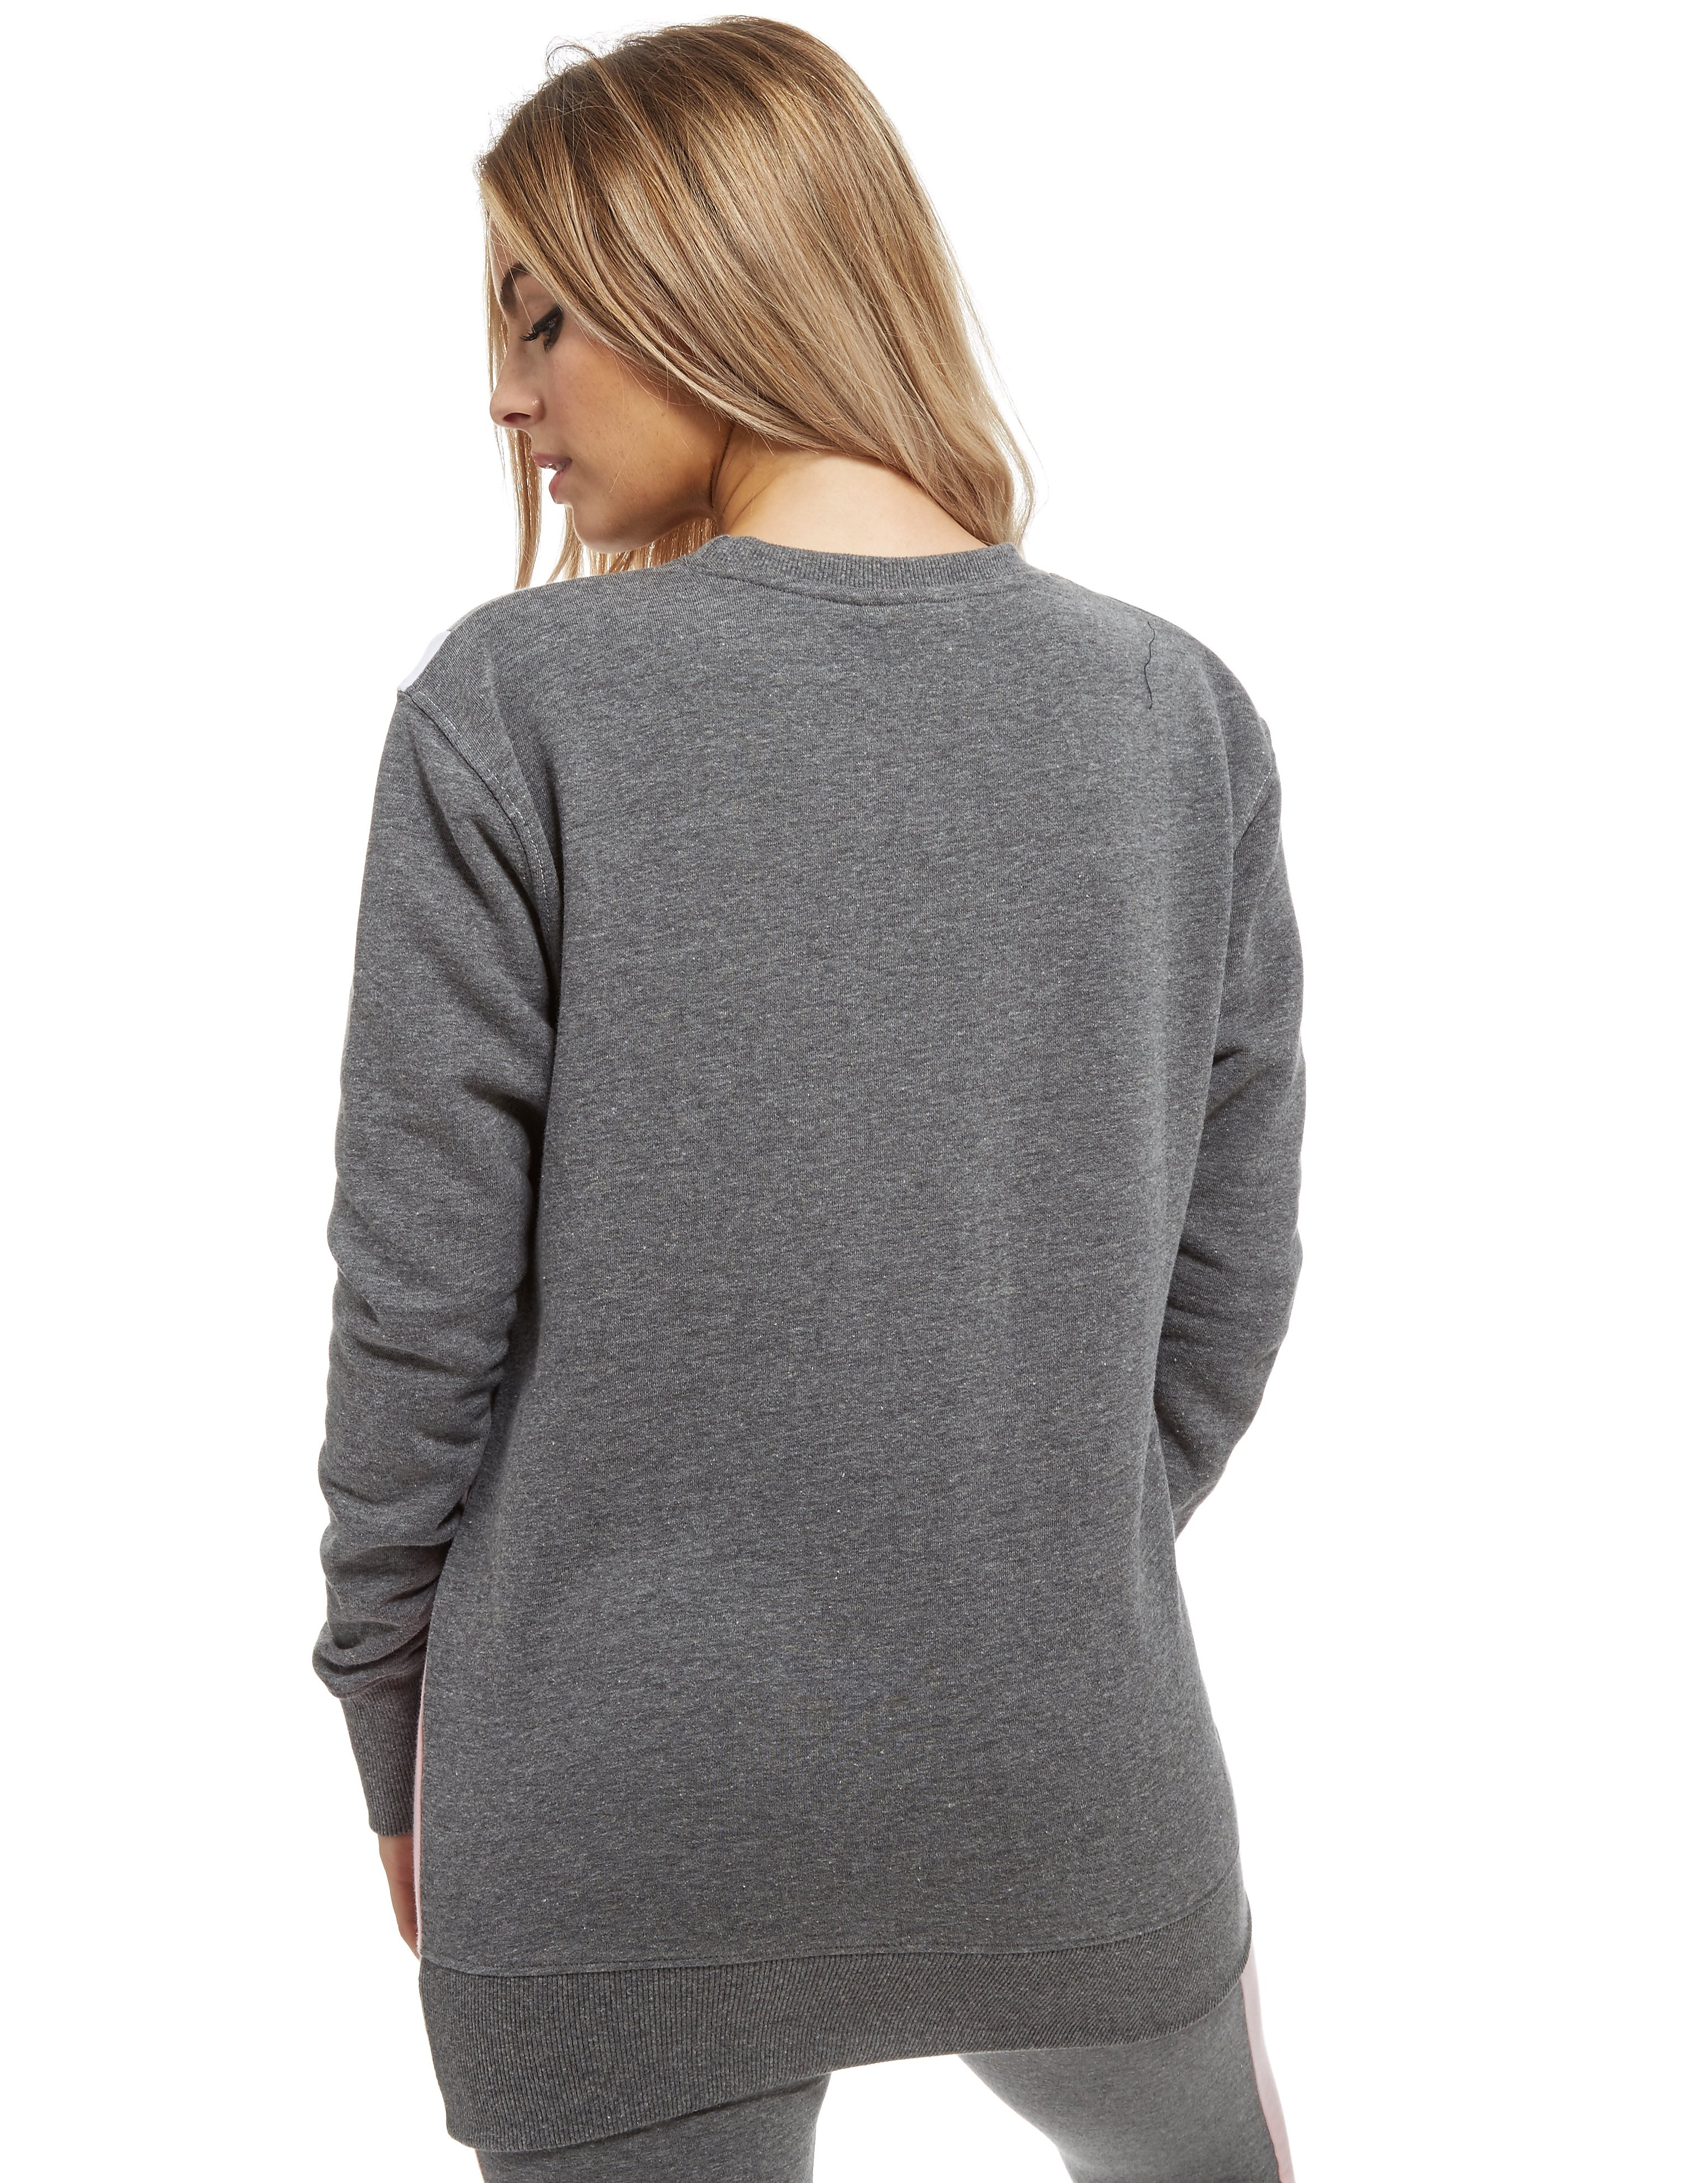 Ellesse Colourblock Crew Sweatshirt